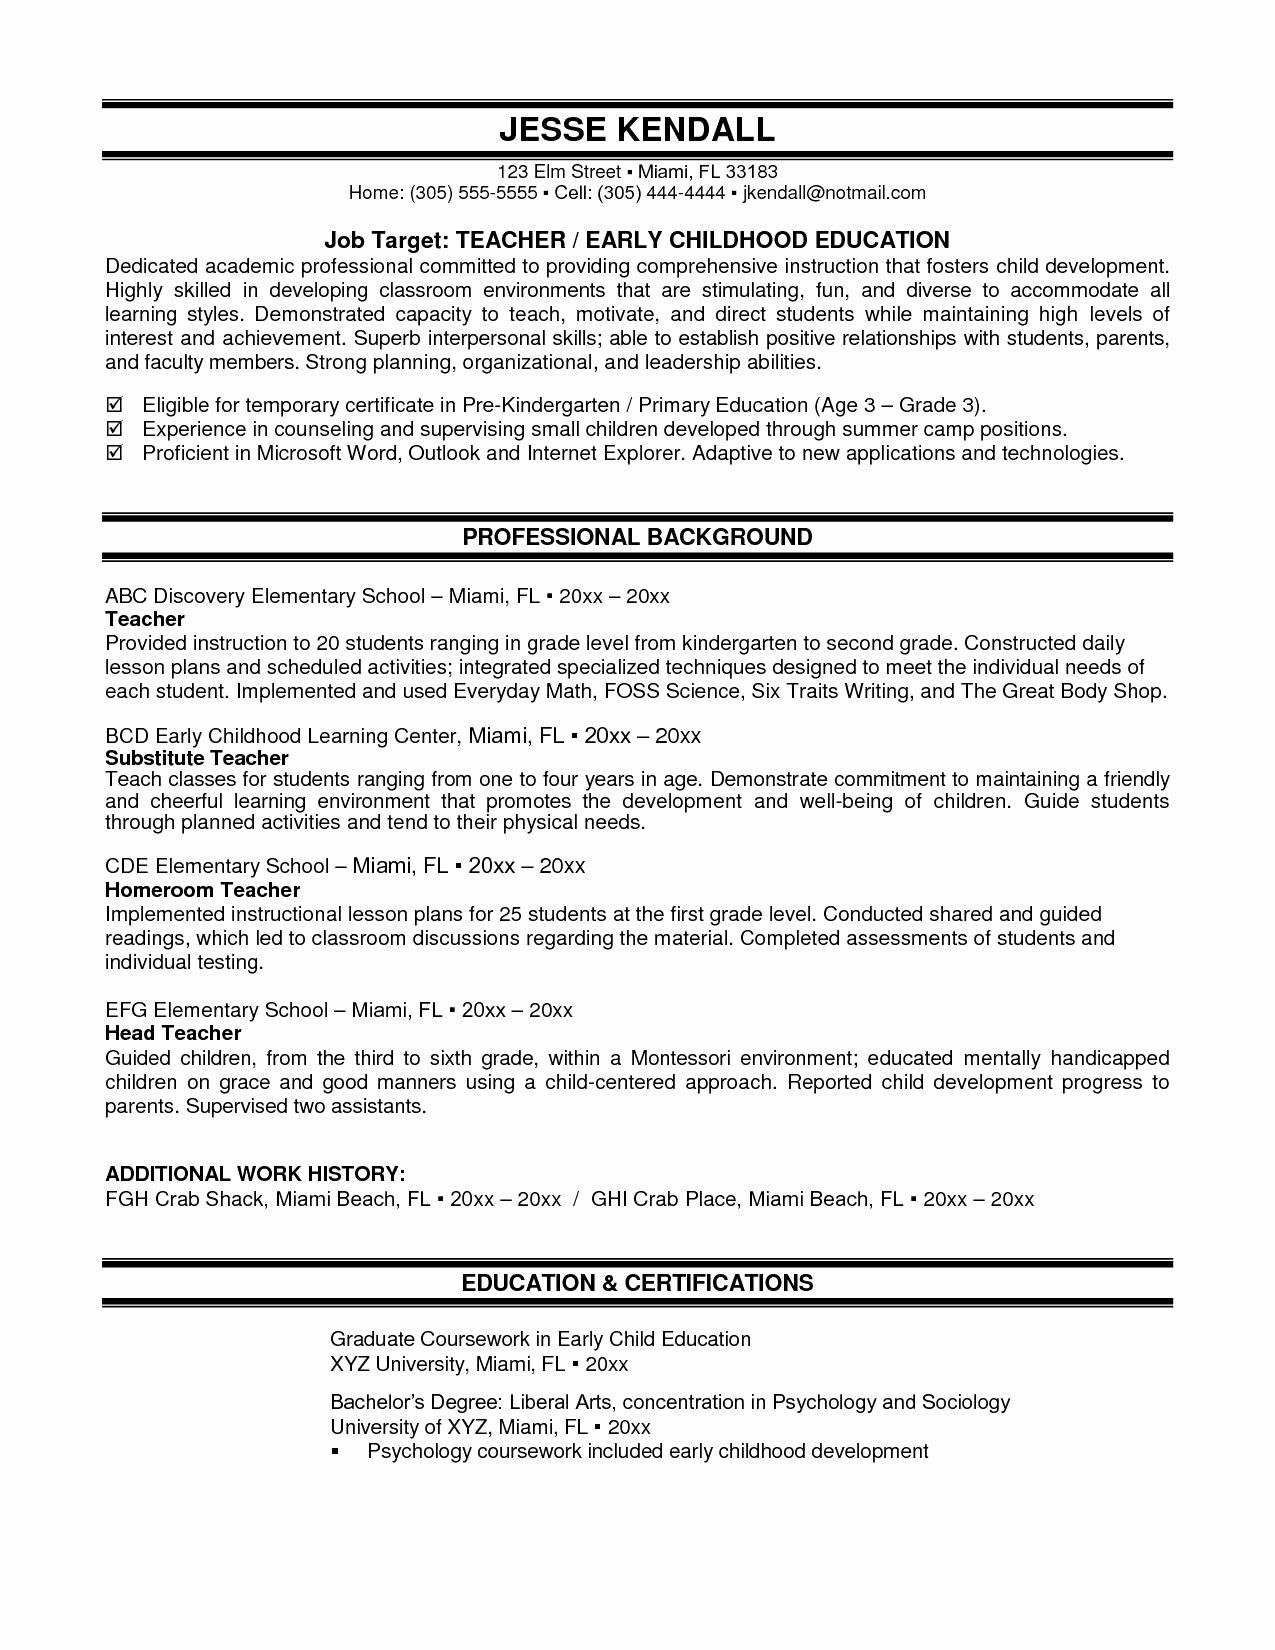 School Progress Report Template  Glendale Community In Summer School Progress Report Template